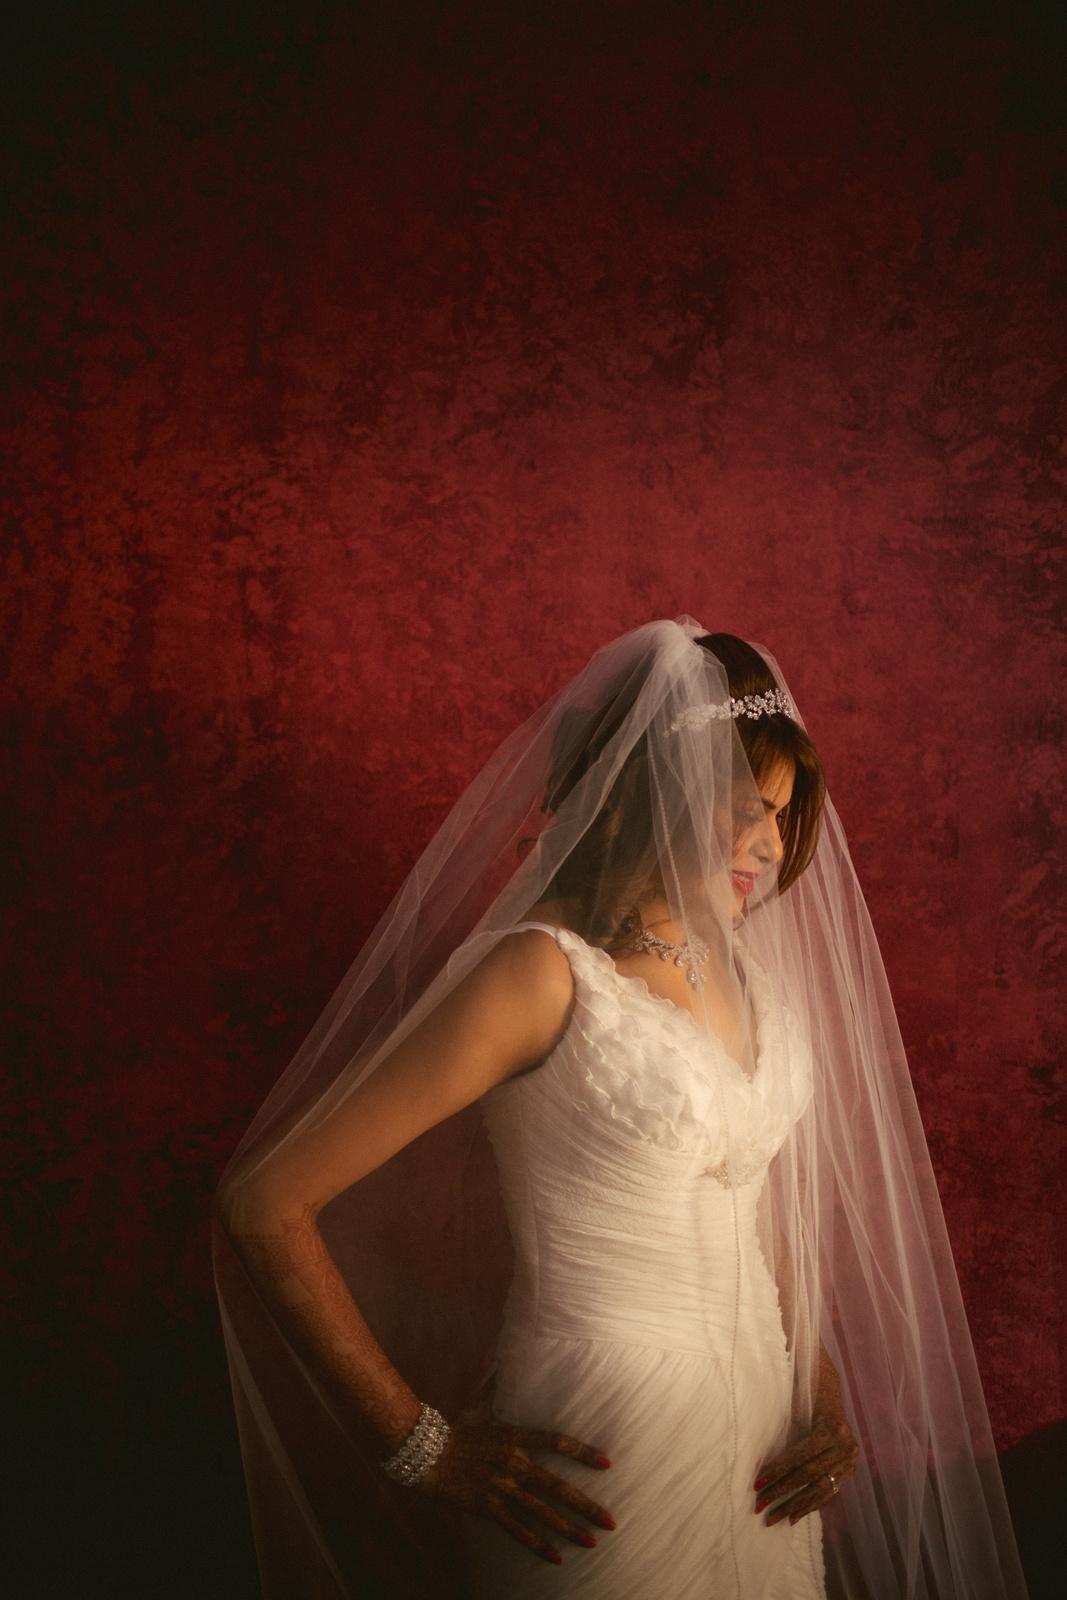 church-wedding-mumbai-into-candid-photography-2712.jpg